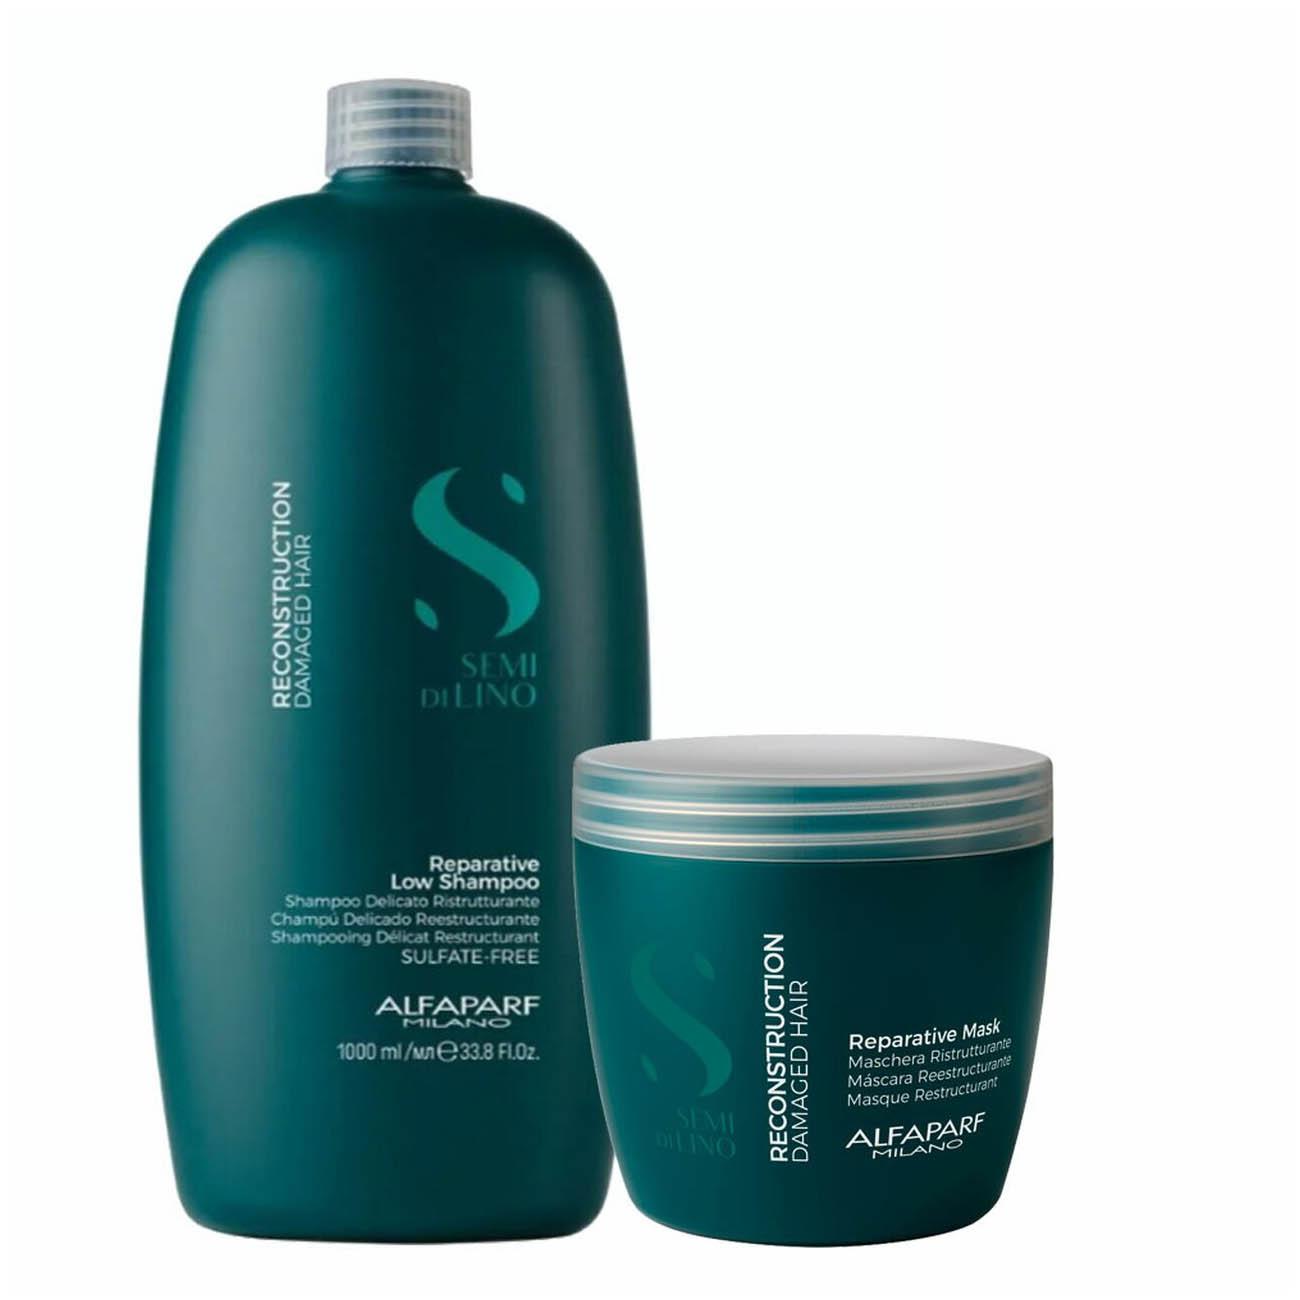 Alfaparf Milano Semi Di LINO Reconstruction Demage Hair Reparative Shampoo and Mask